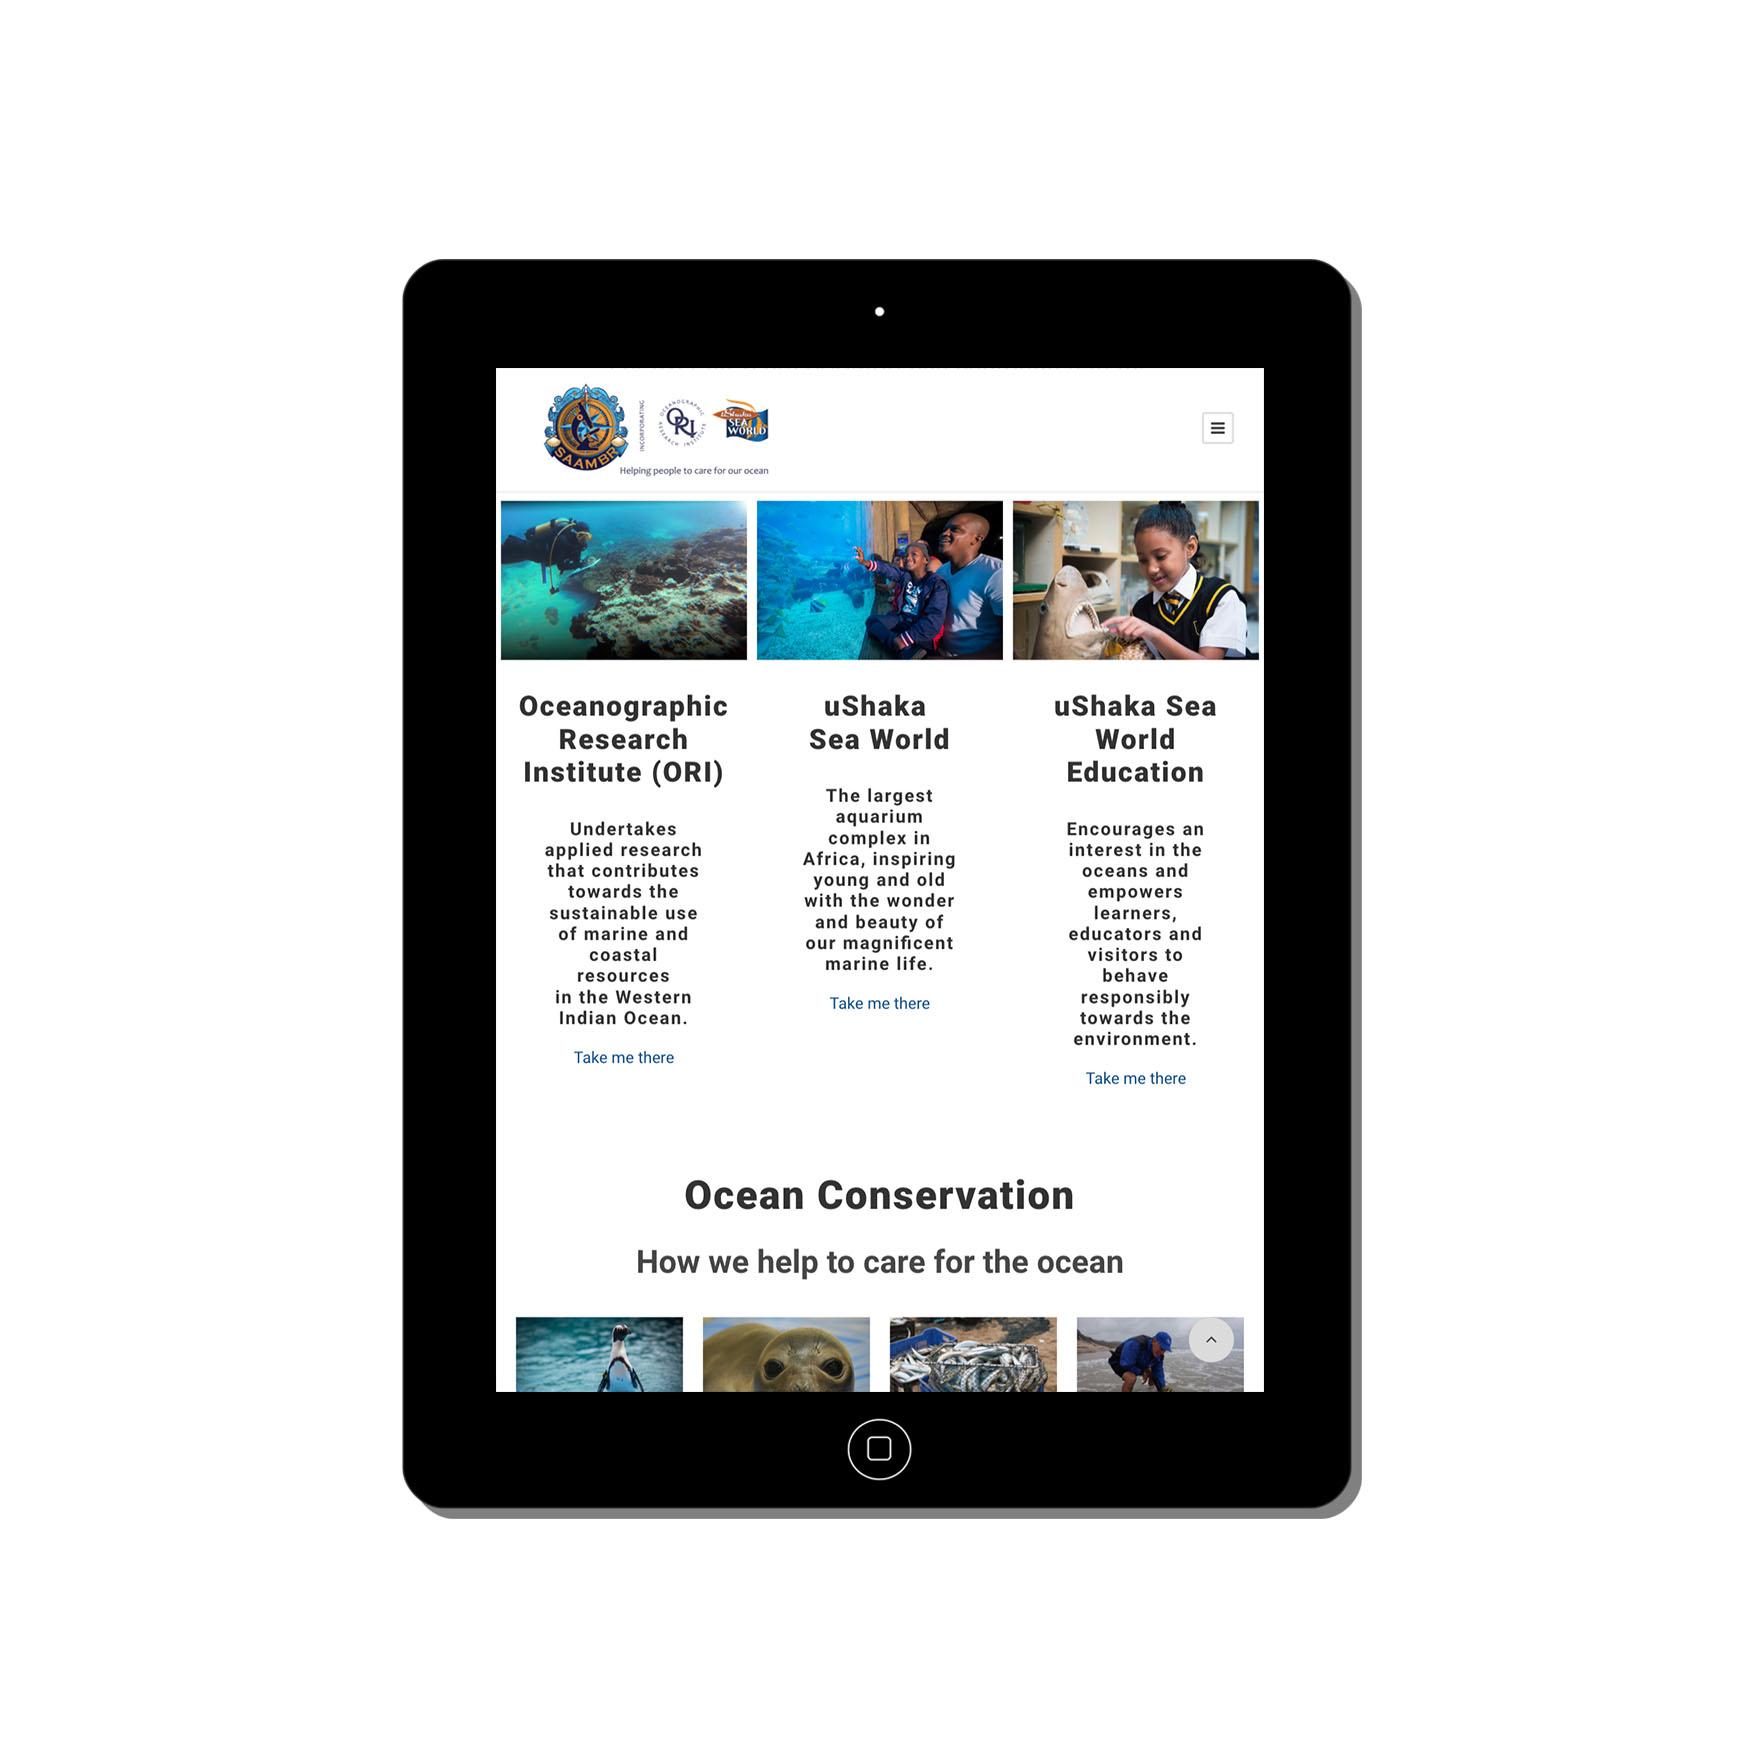 saambr-web-design-portfolio-webdoor-responsive-web-design-agency-hillcrest-kwazulu-natal-tablet